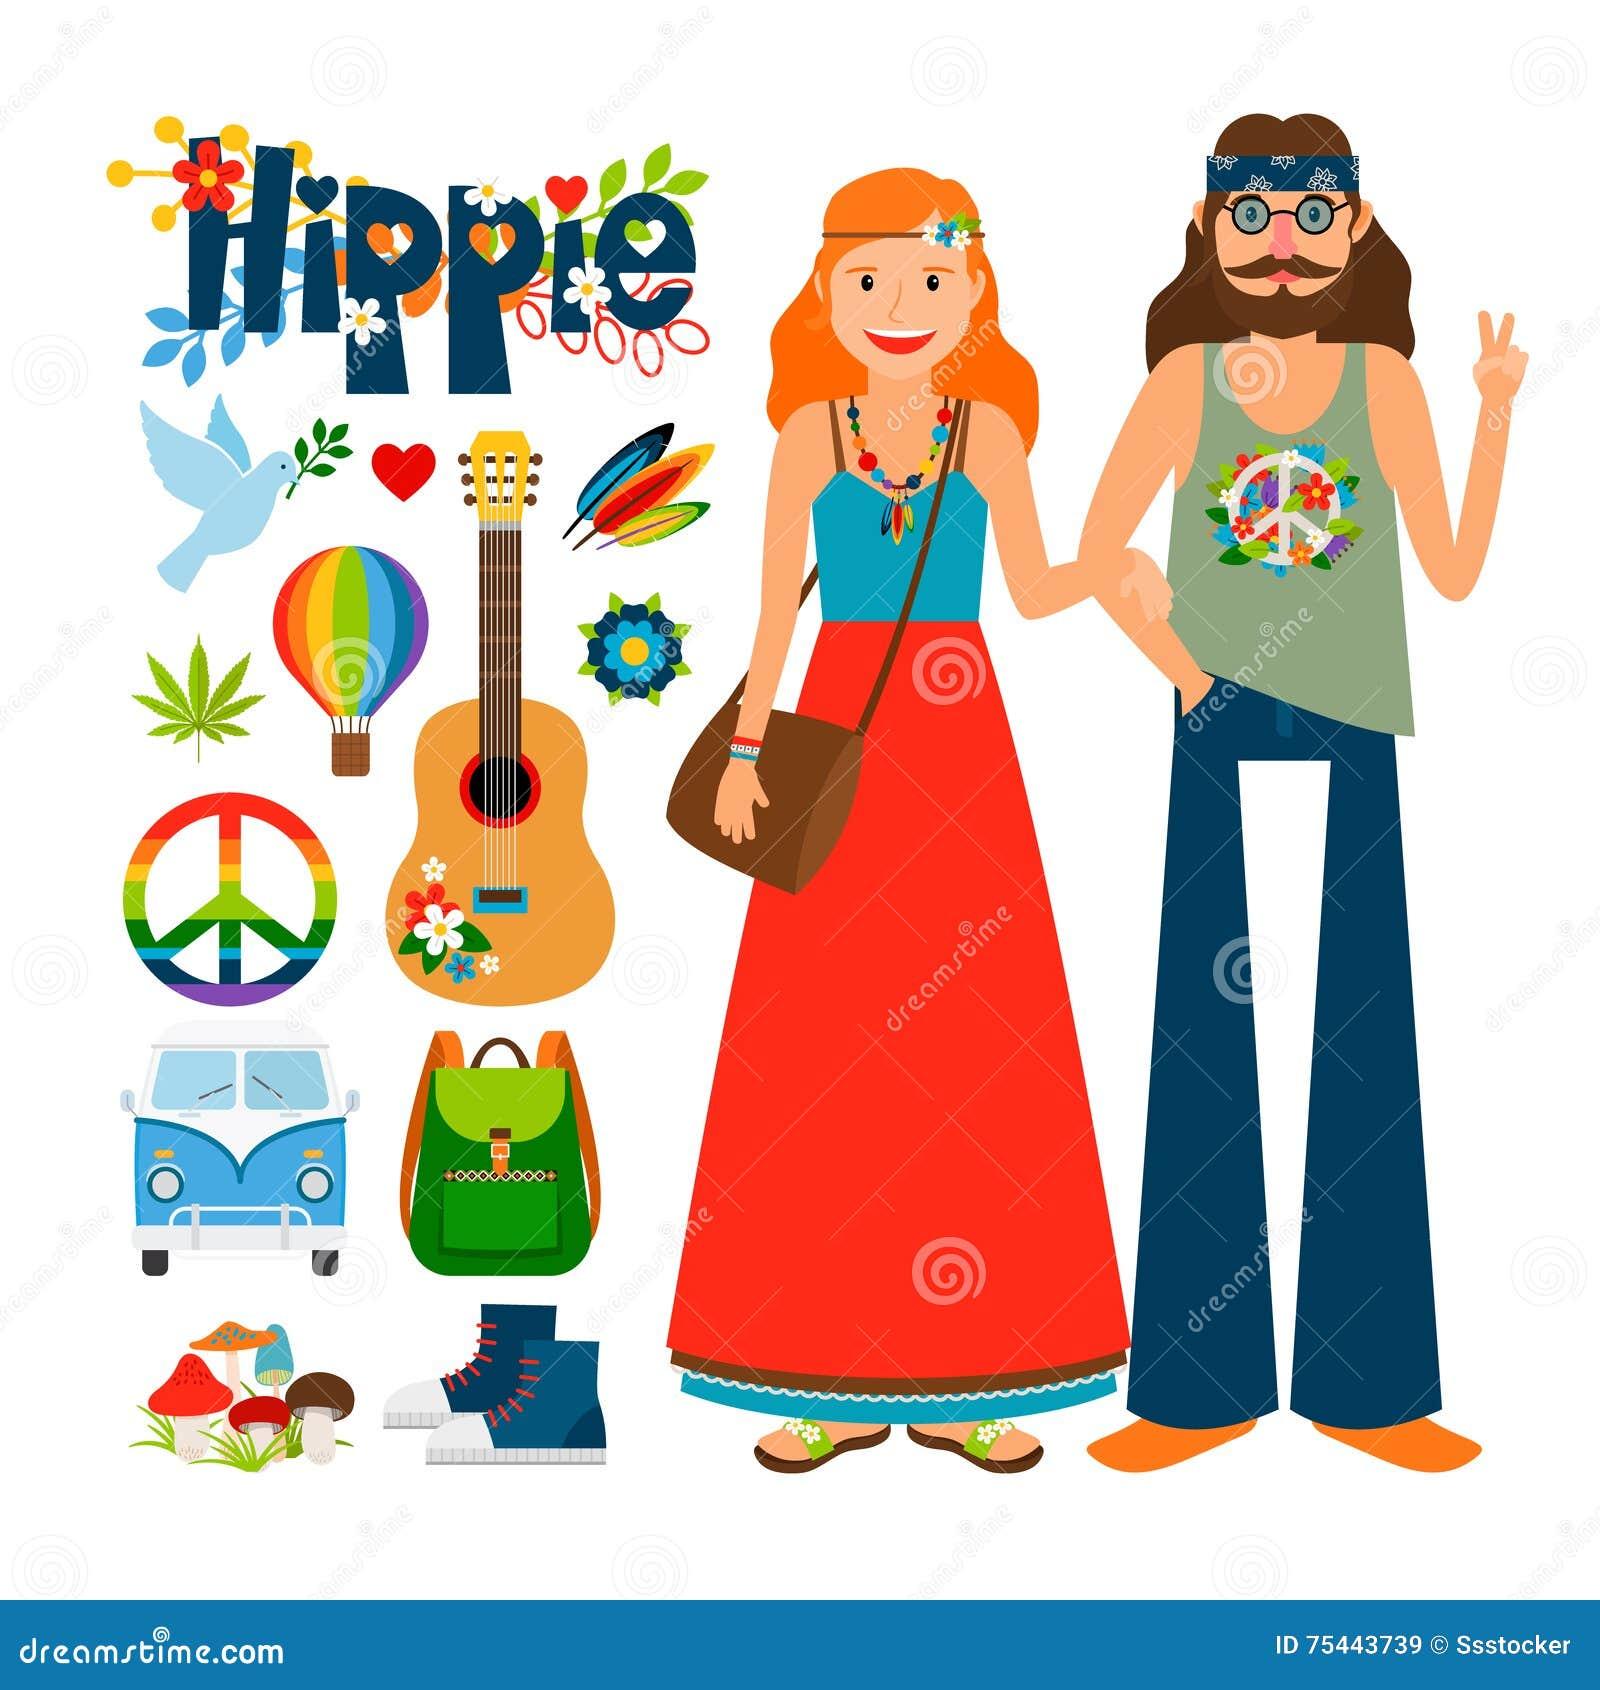 Hippie people vector icons